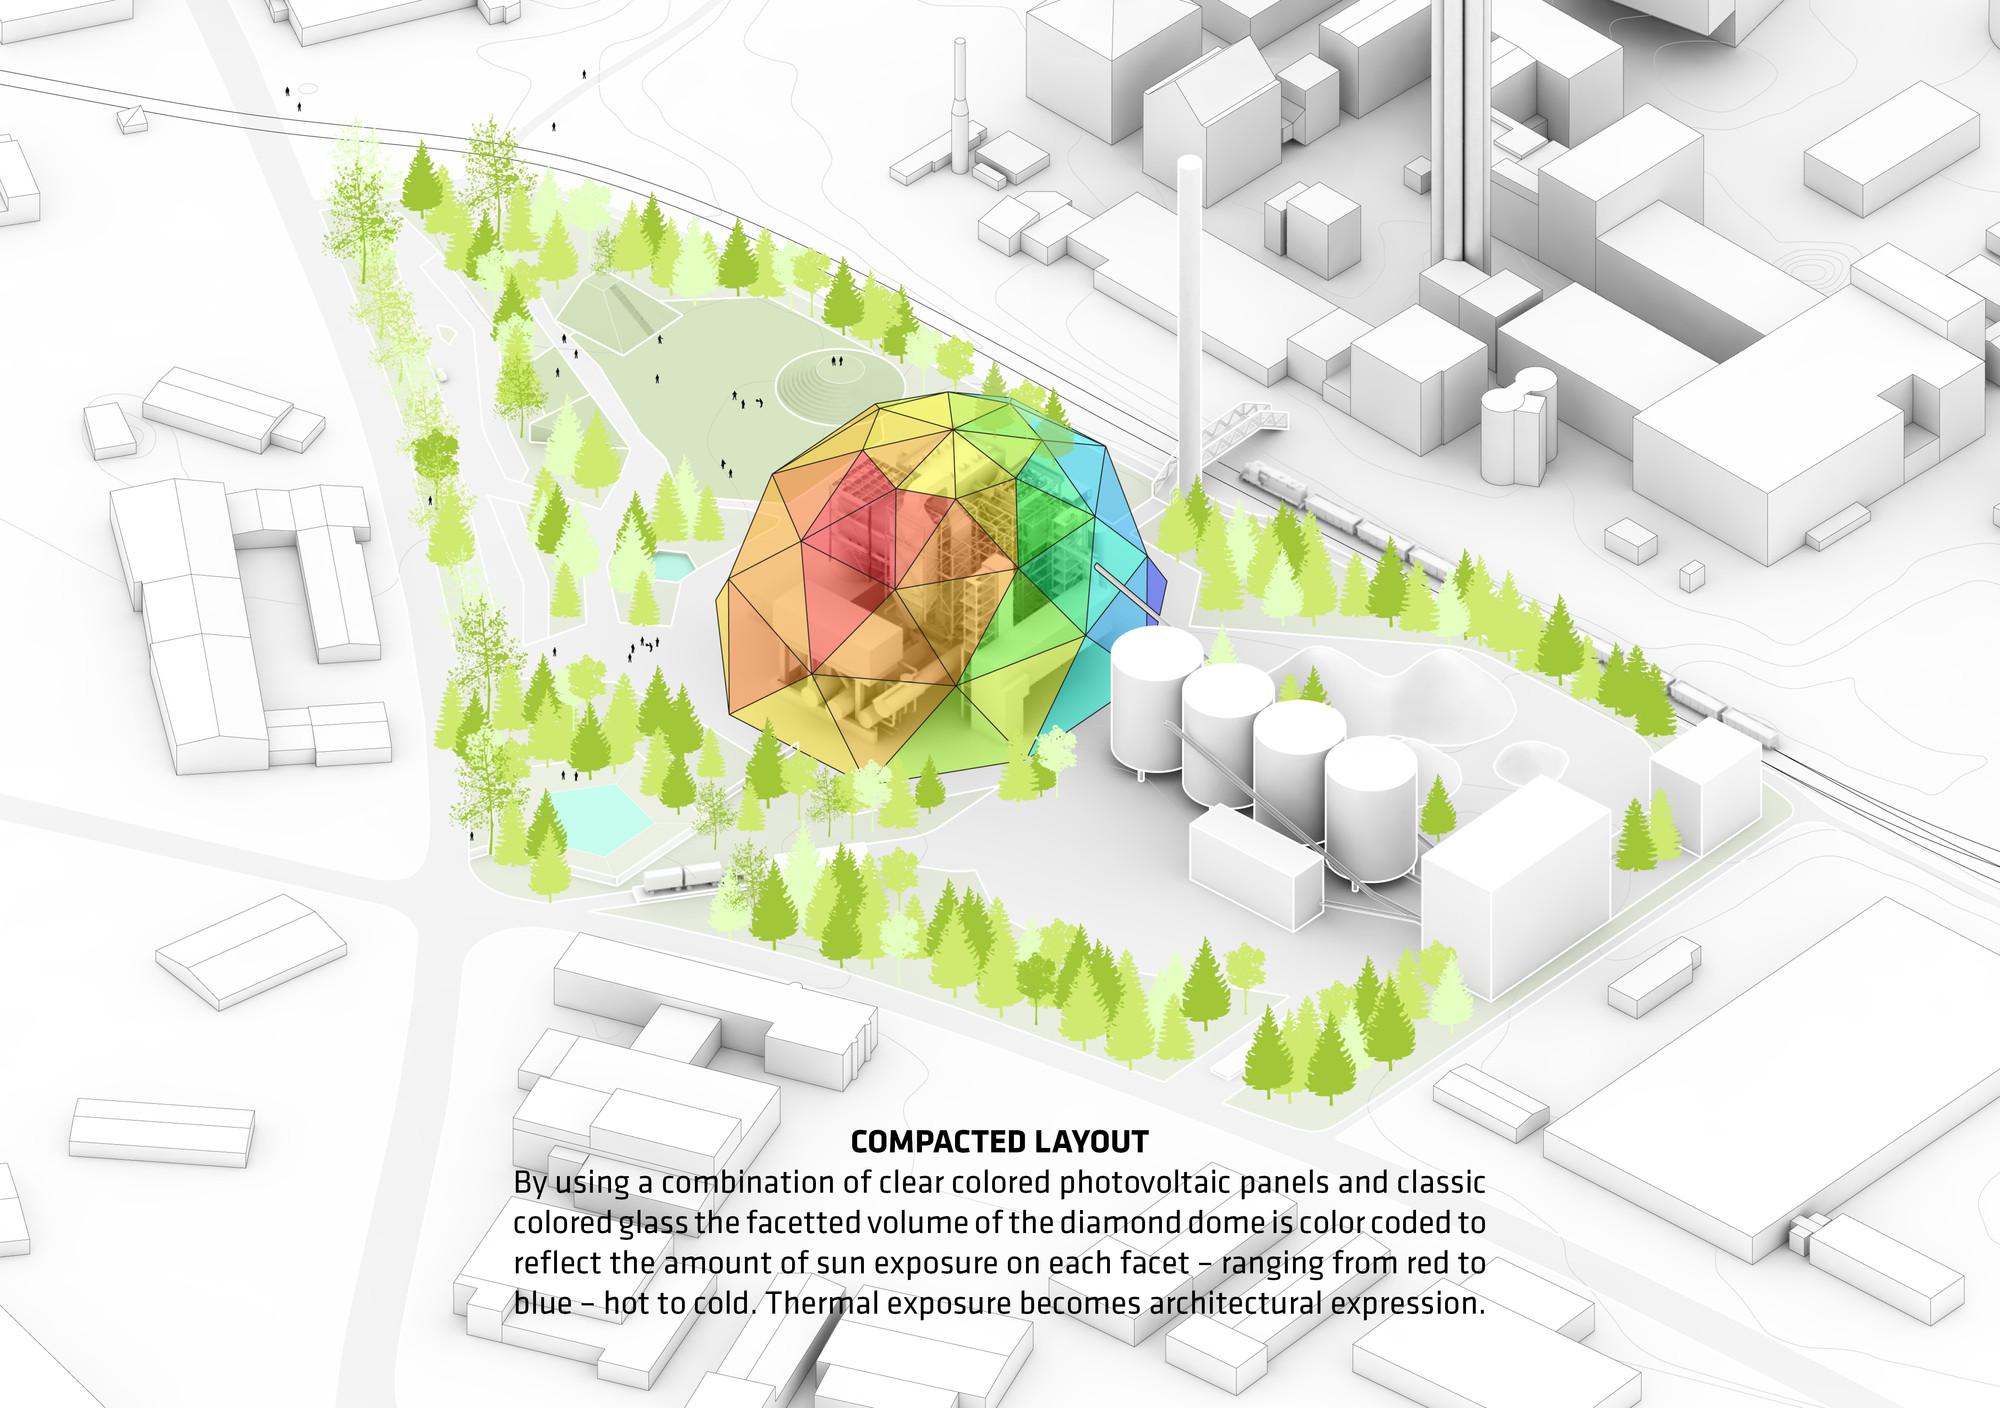 Gallery Of Bigs Unconventional Uppsala Power Plant Designed To Layout Images Host Summer Festivalscourtesy Big